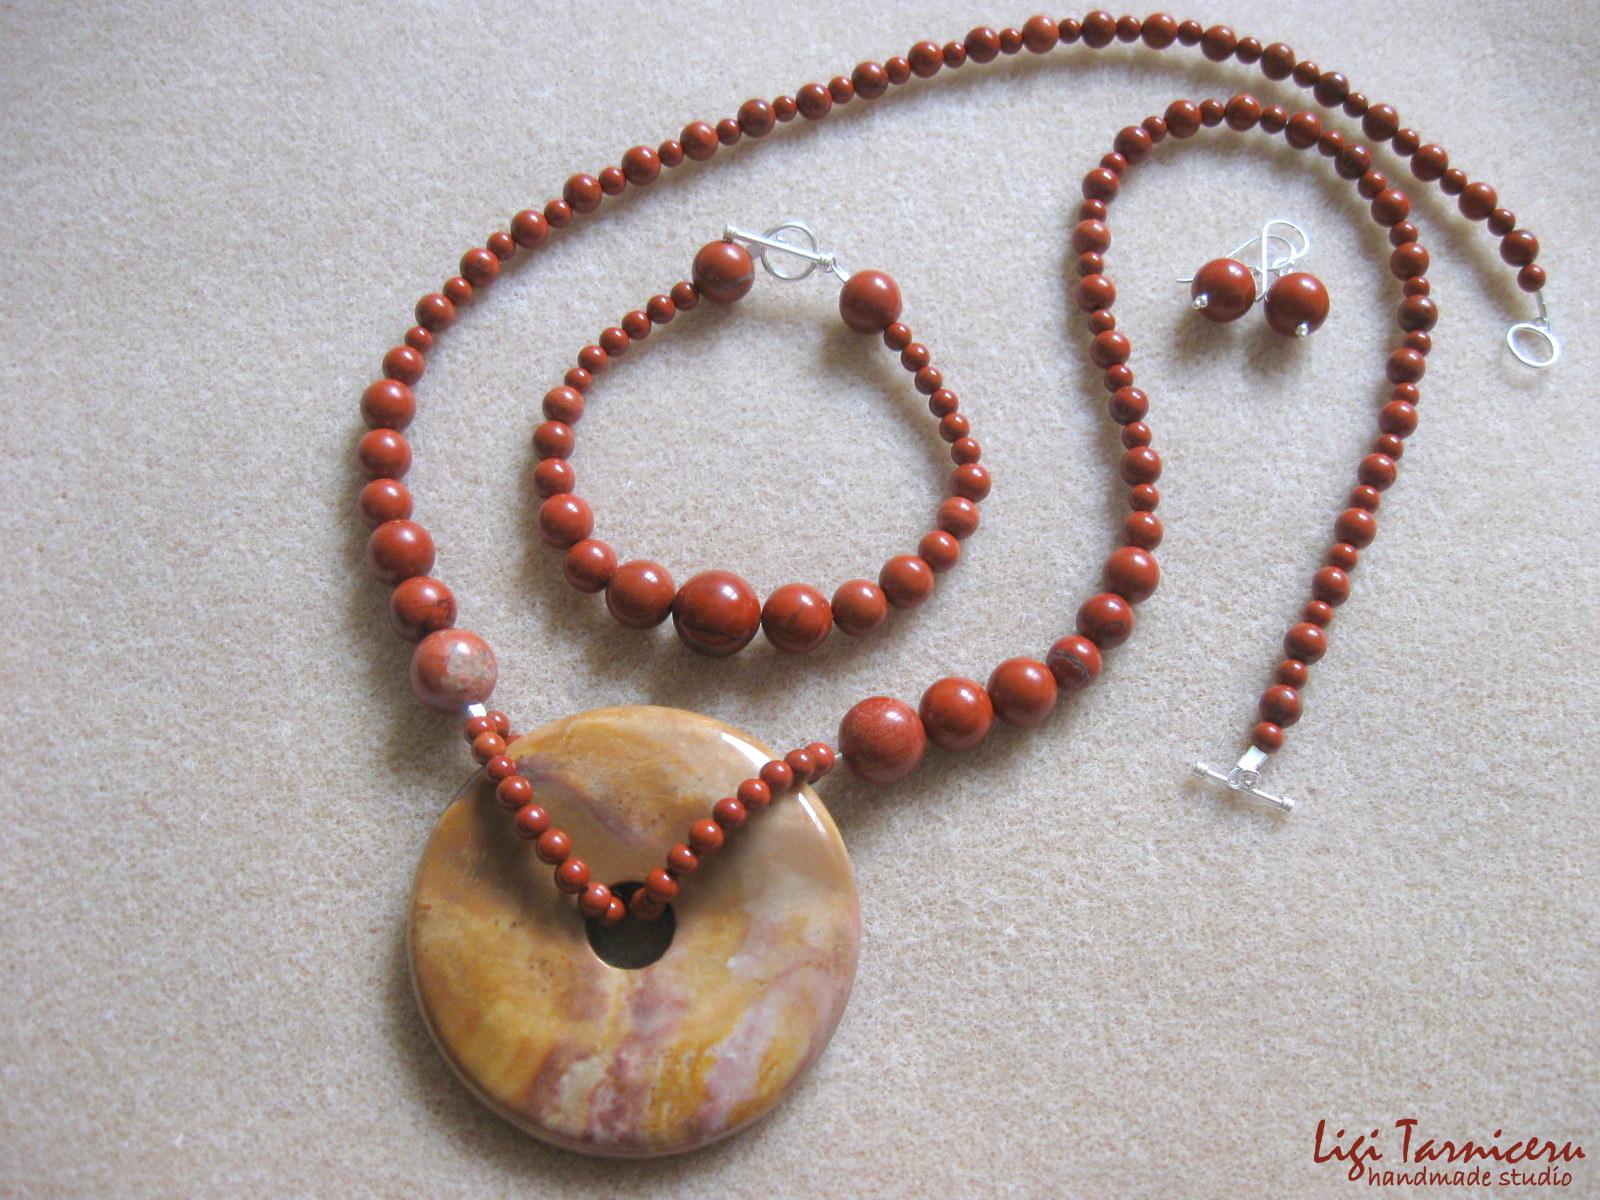 Red jasper, agate pendant - necklace, bracelet and earrings set